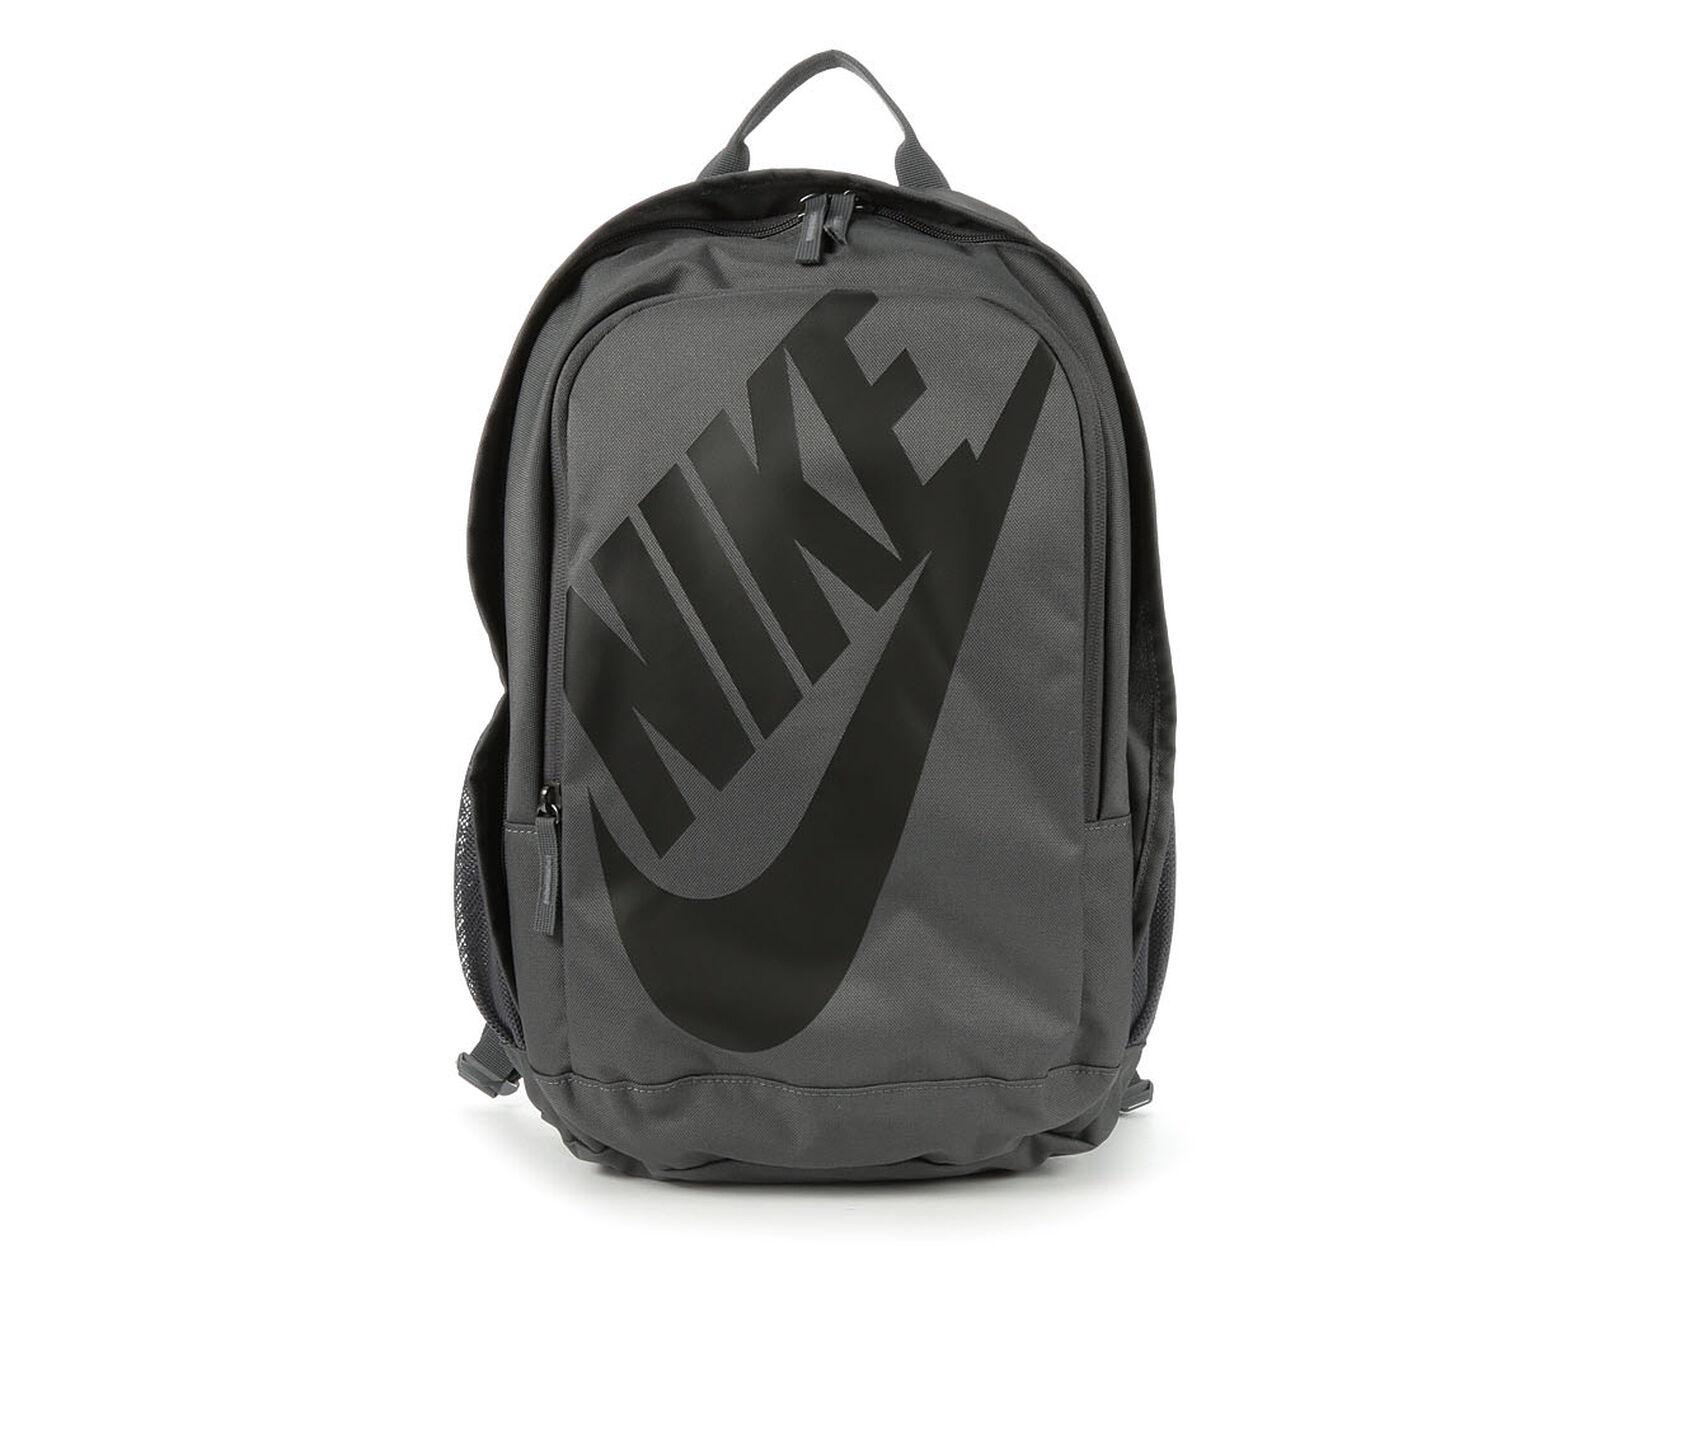 3f5c09ec5eea8 Nike Hayward Futura Backpack. Previous